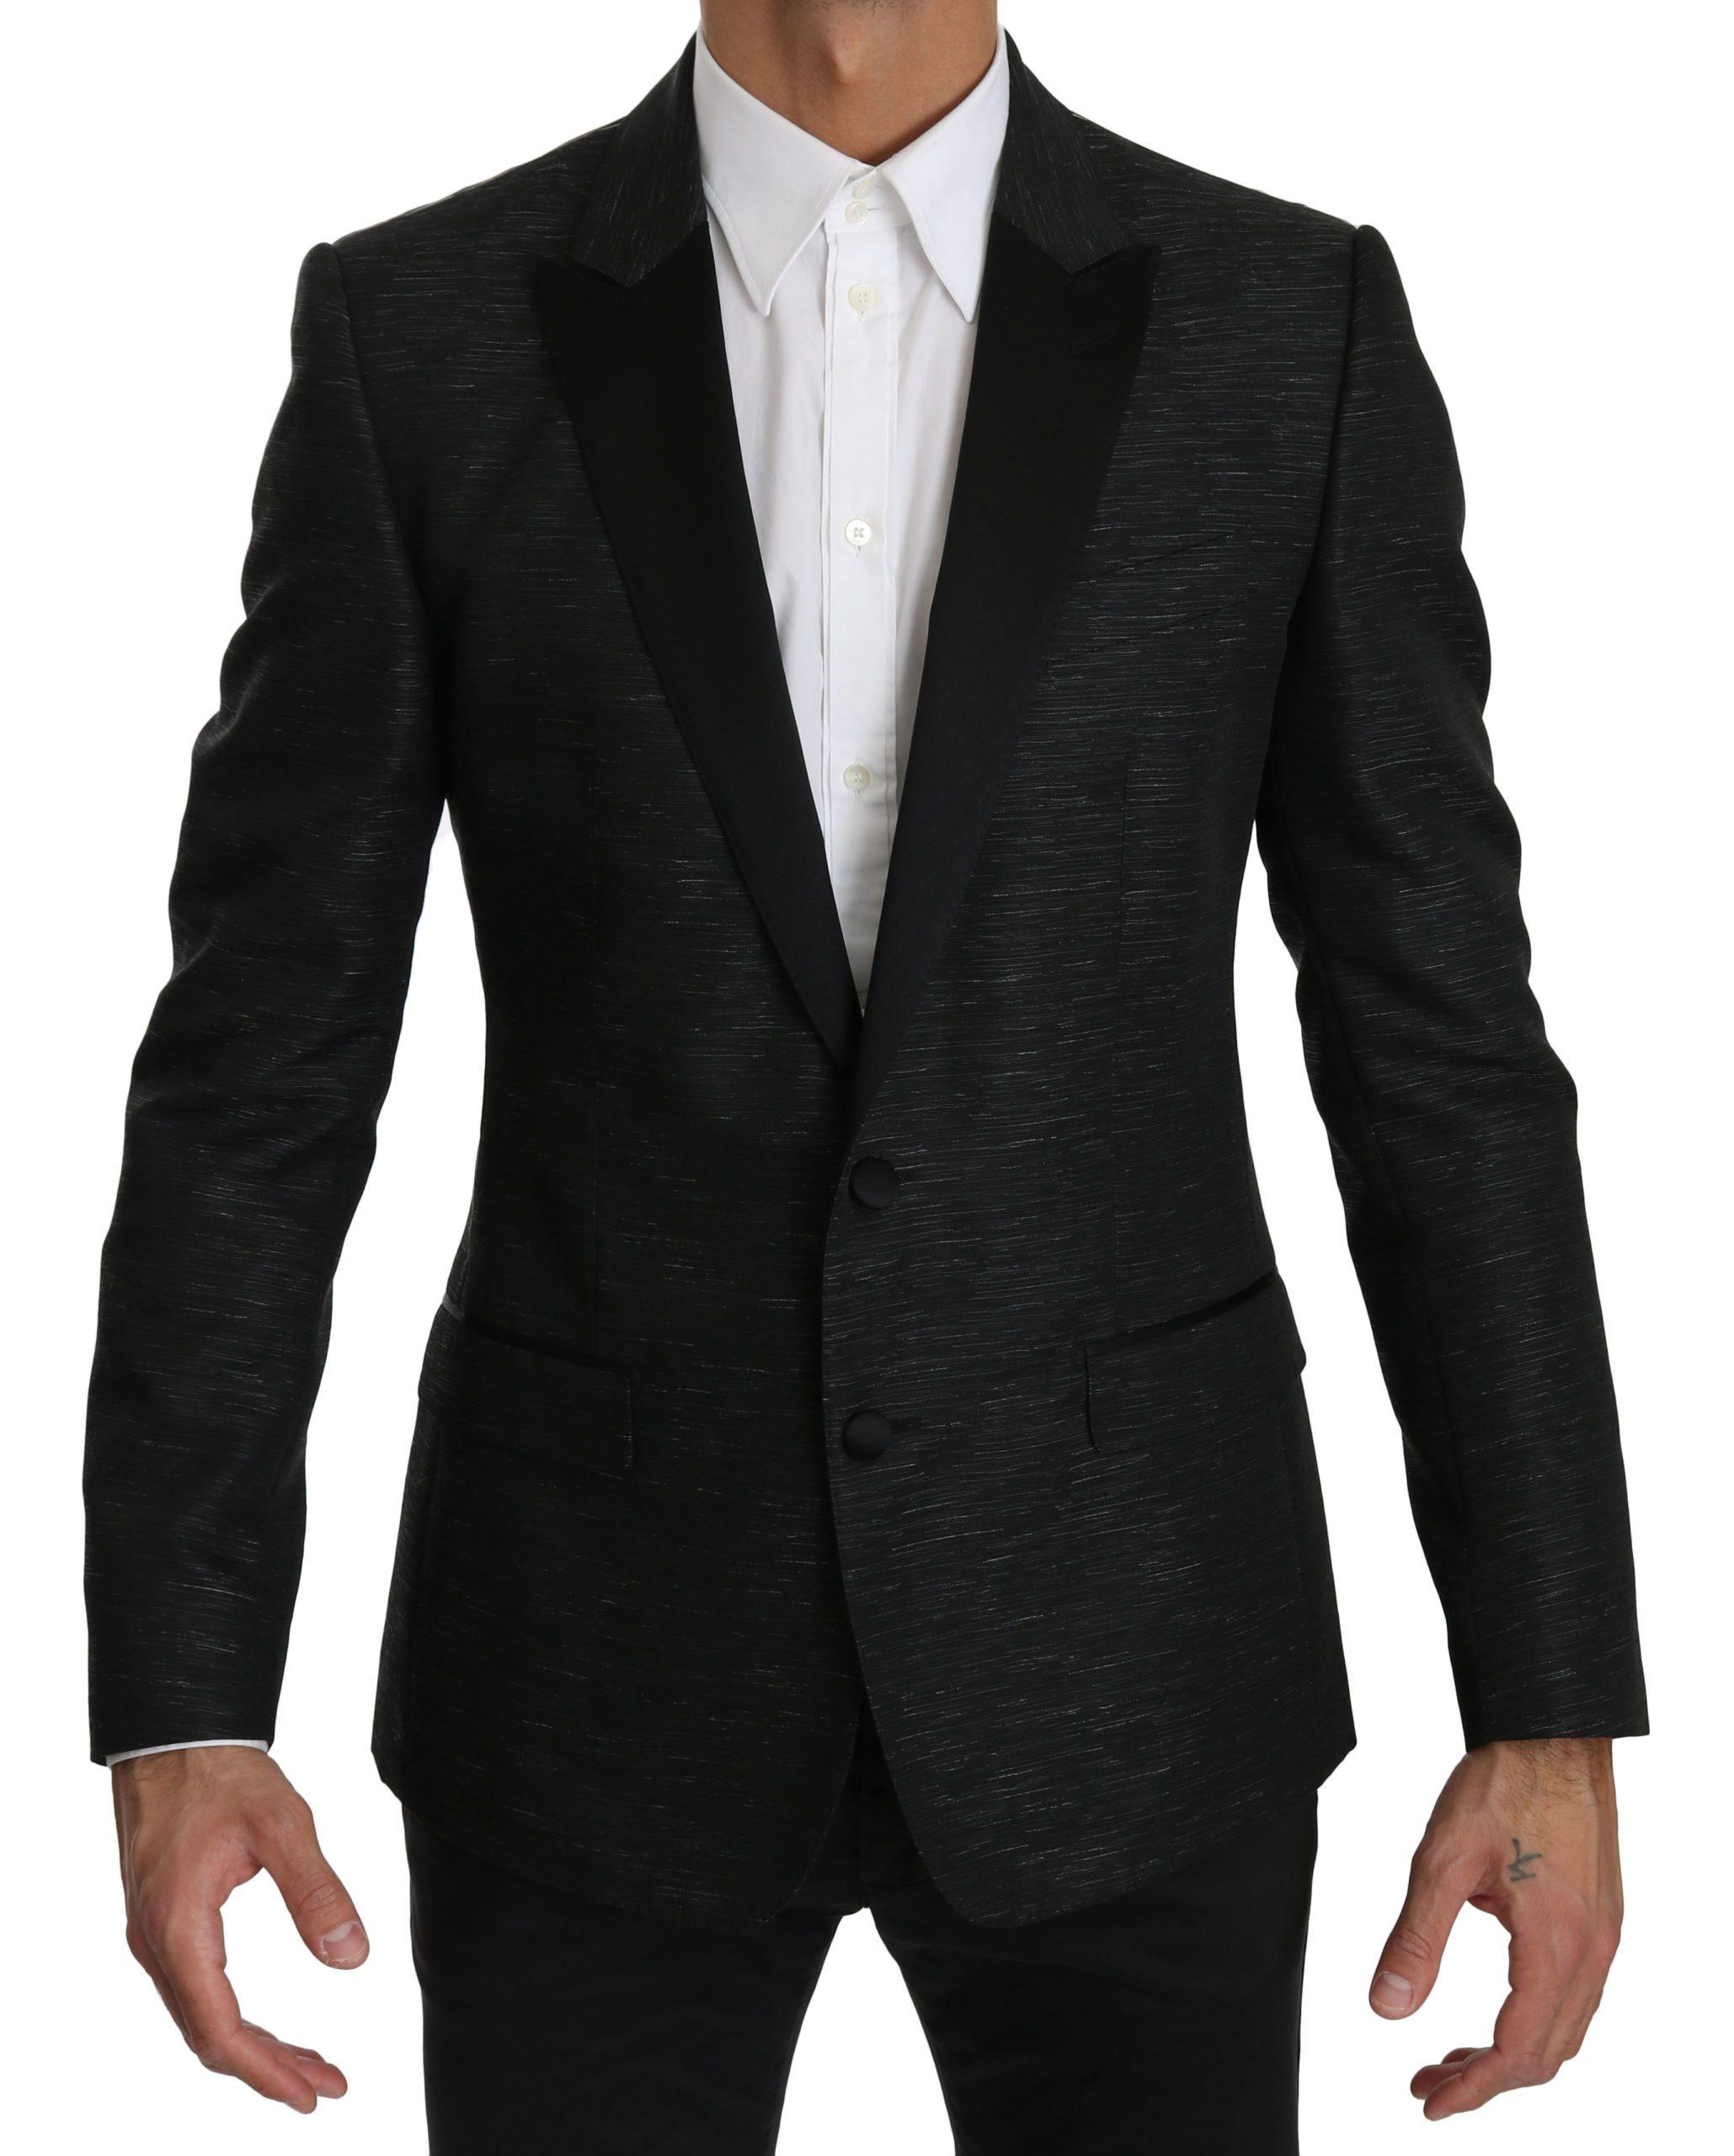 Dolce & Gabbana Men's Slim Fit One Piece MARTINI Blazer Black KOS1563 - IT48 | M